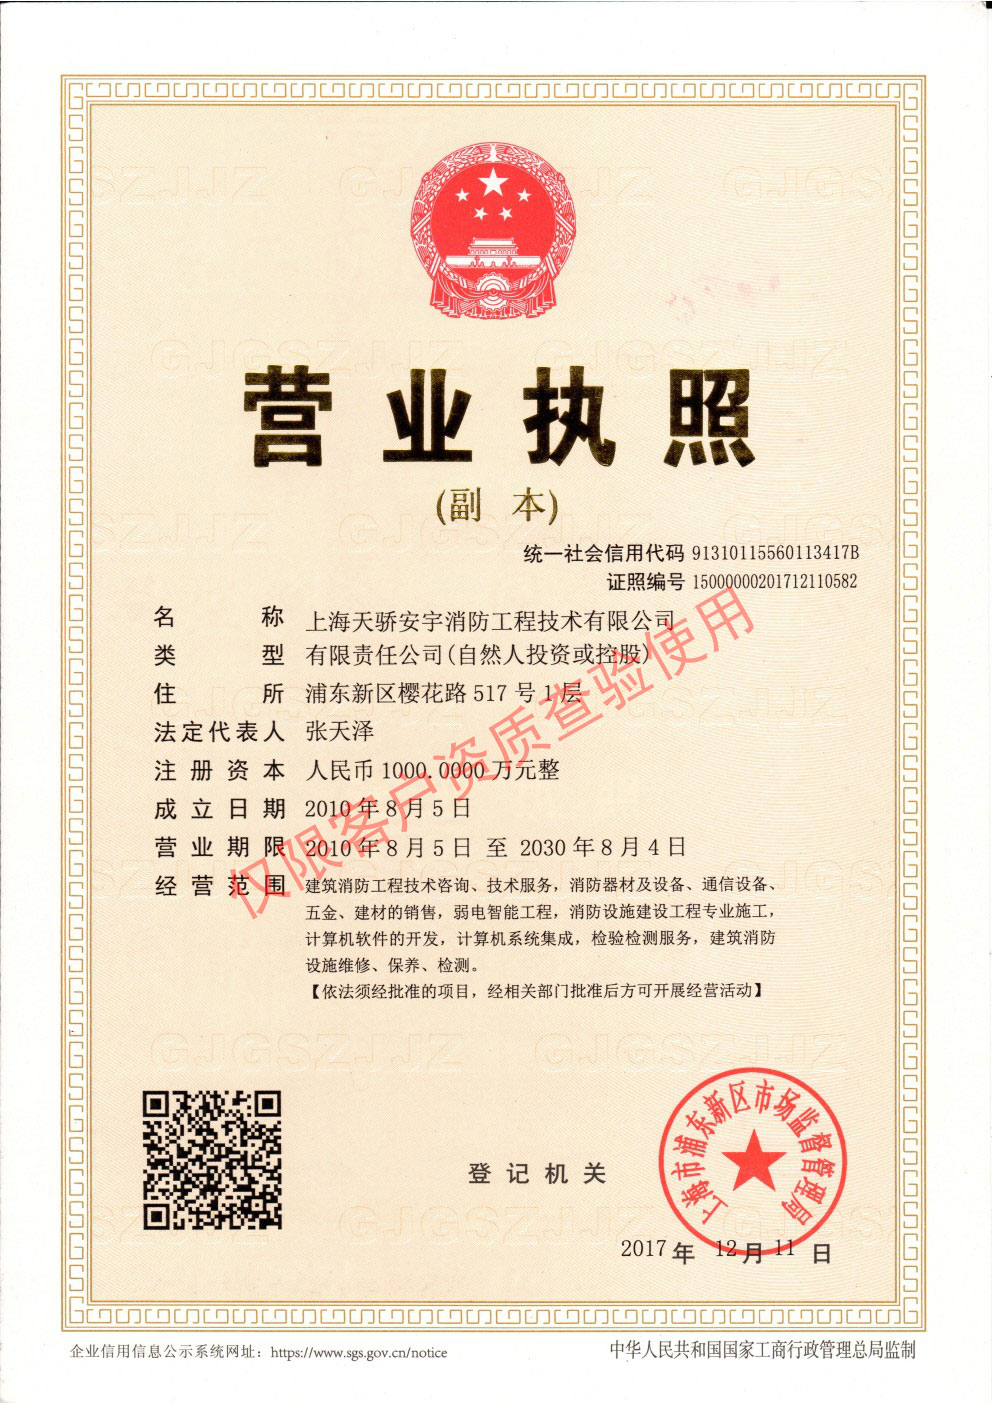 betway178必威体育手机下载营业执照